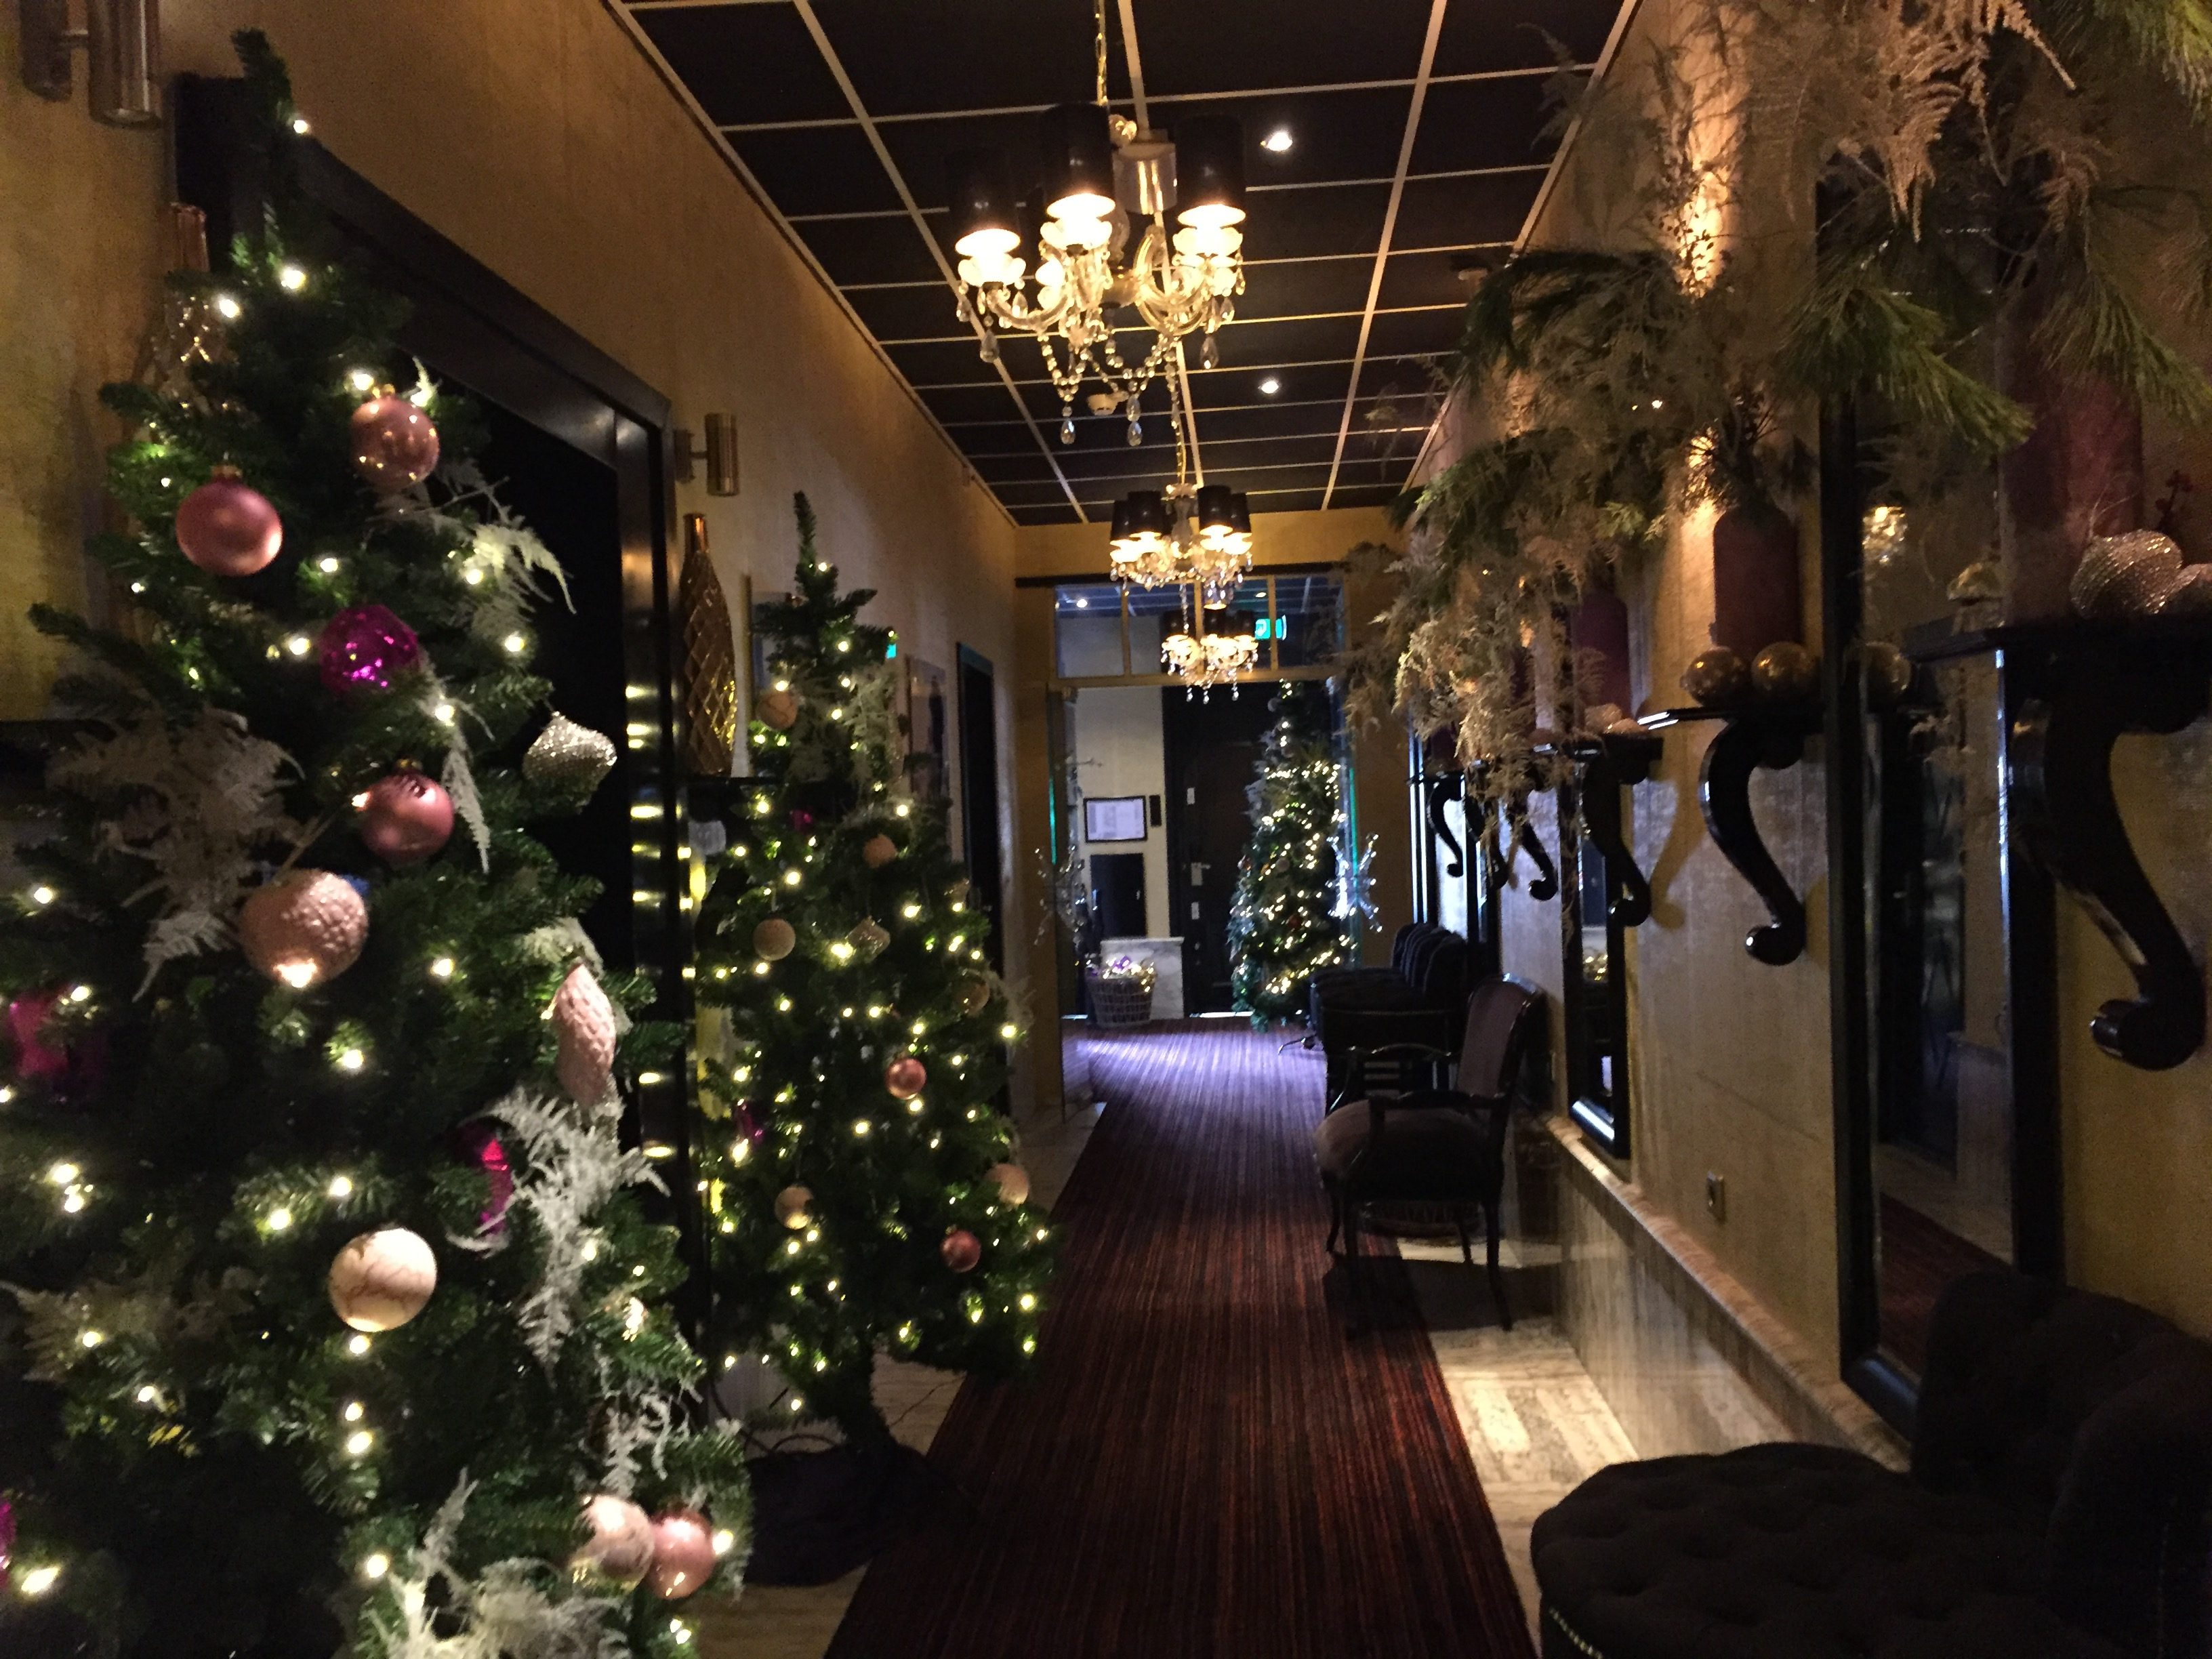 IMG 0336 e1527115844286 - El Hotel Sebastian's en Amsterdam